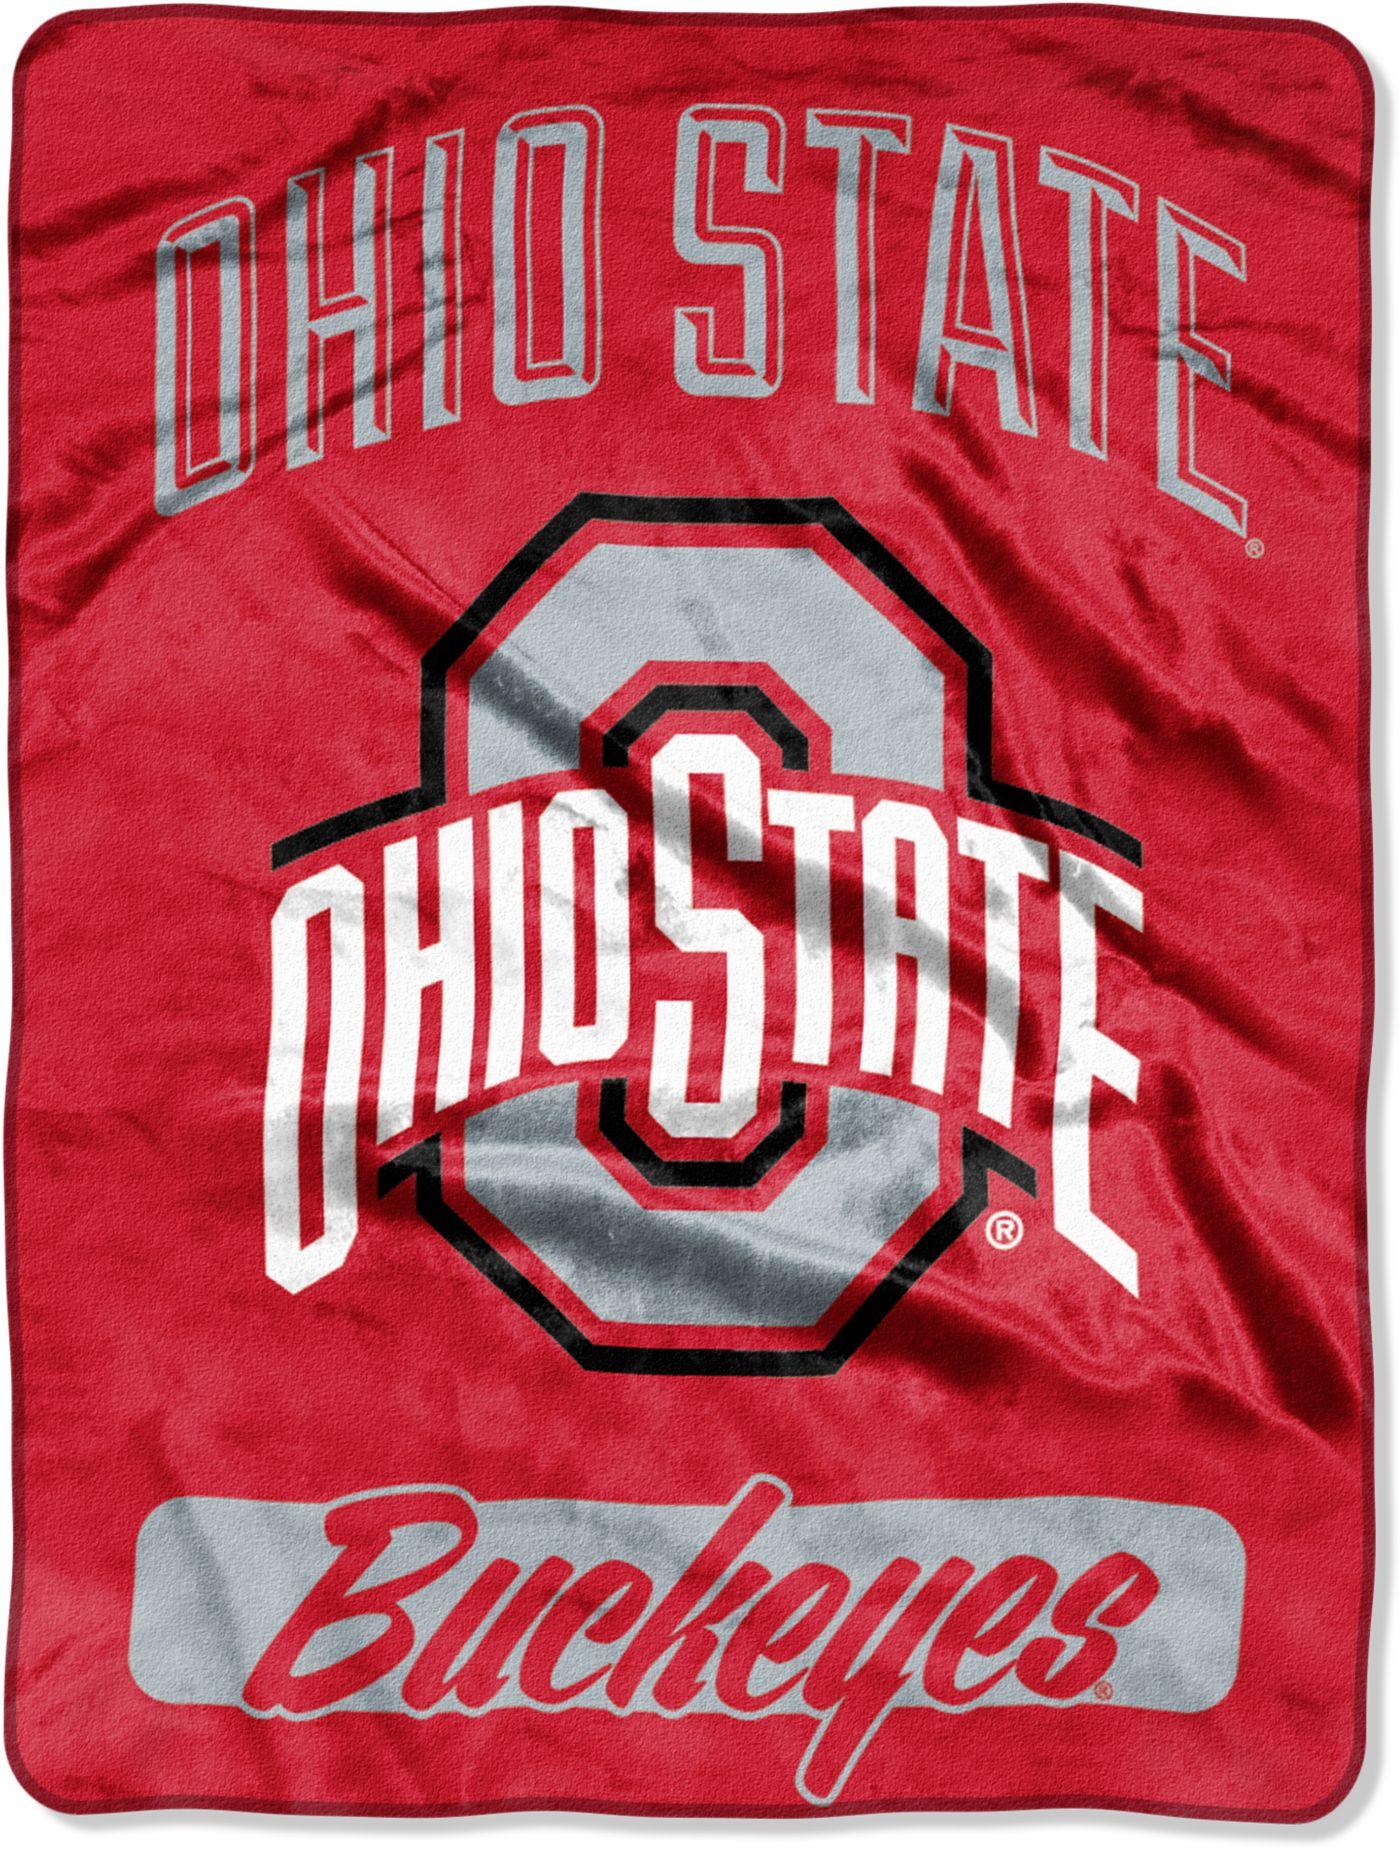 Northwest Ohio State Buckeyes Blanket